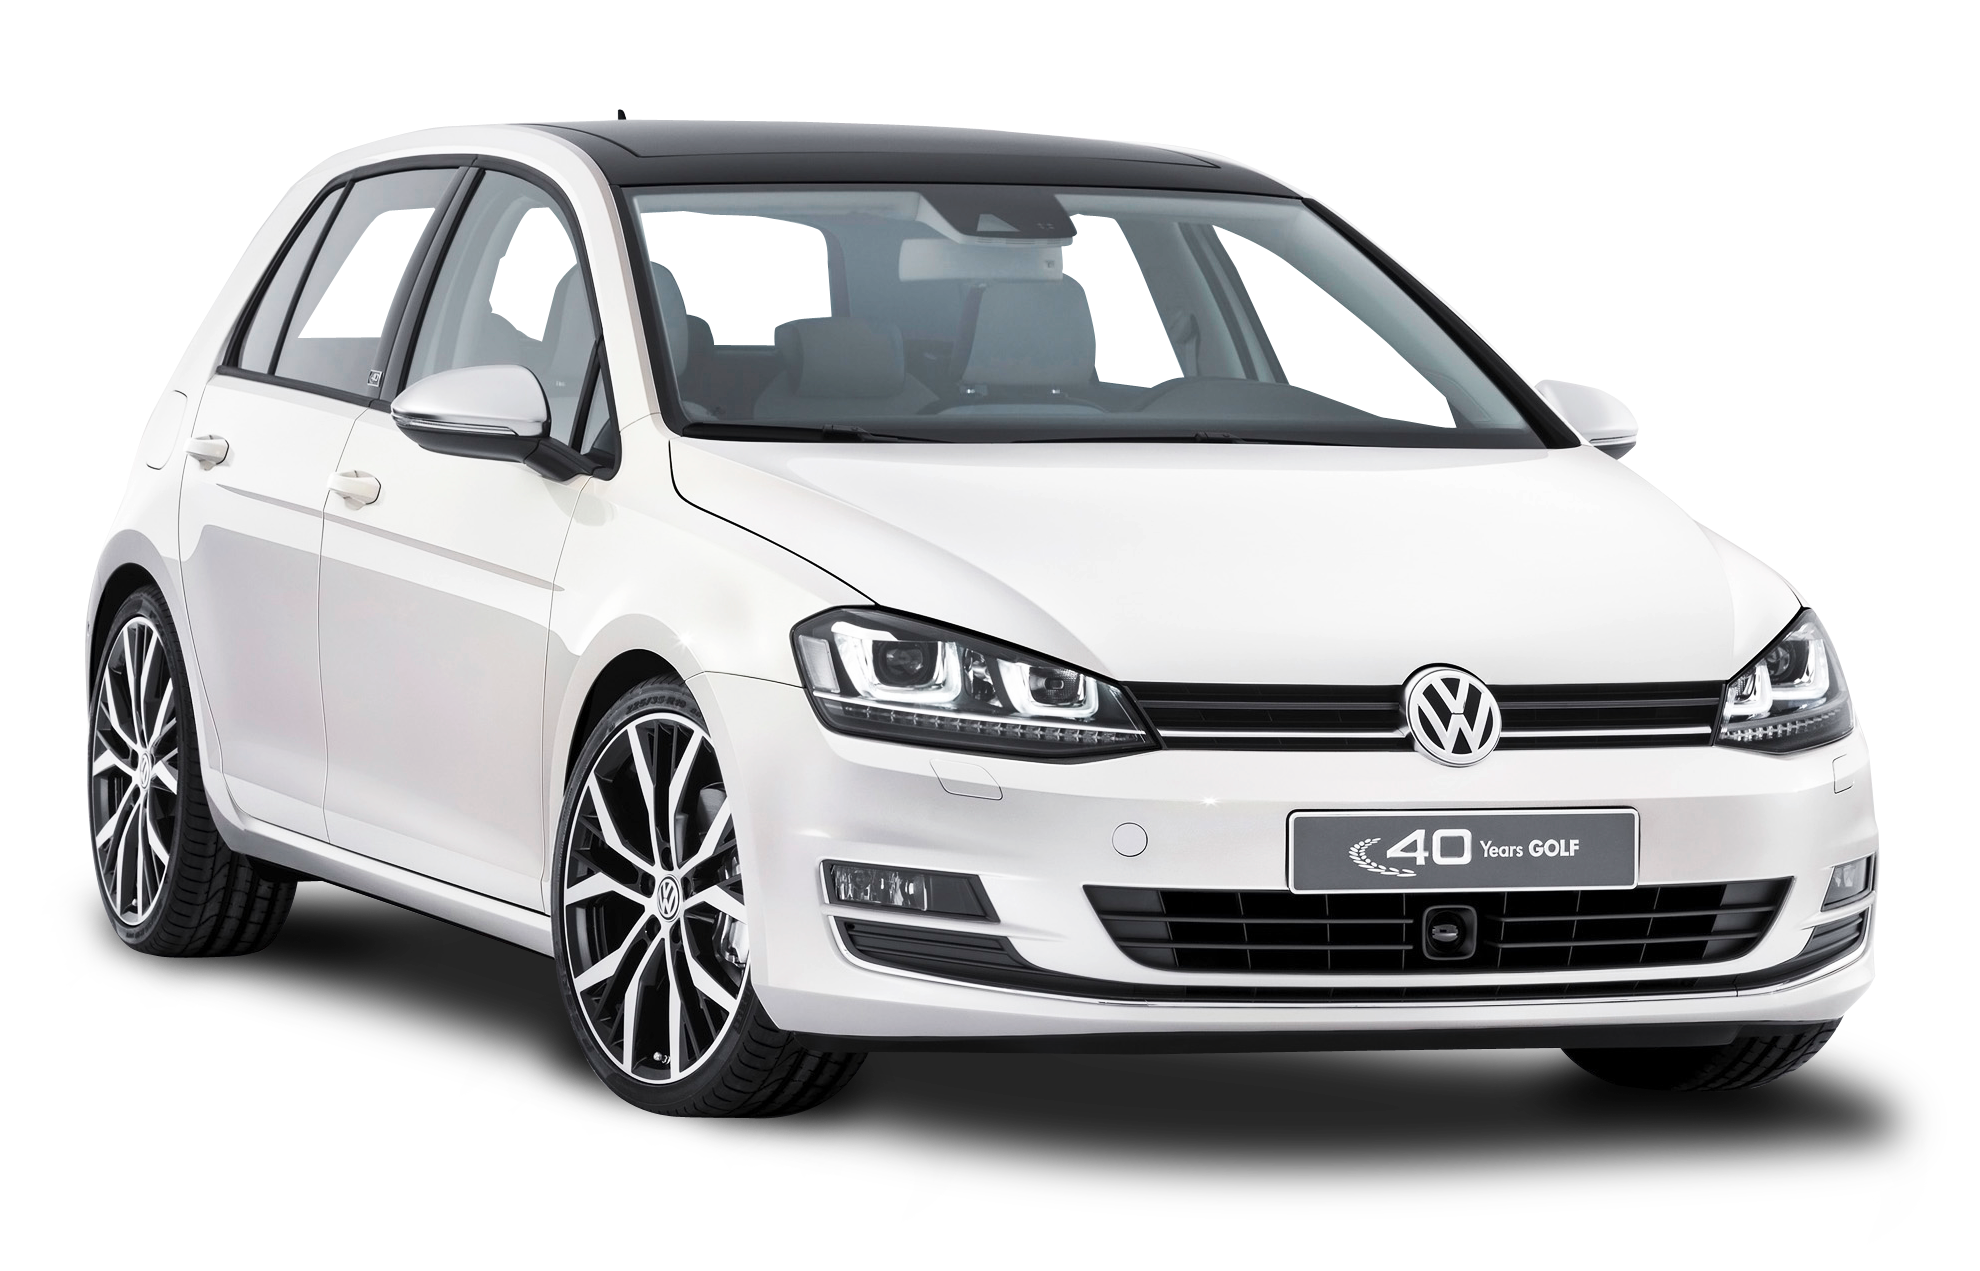 VW GOLF 6 +